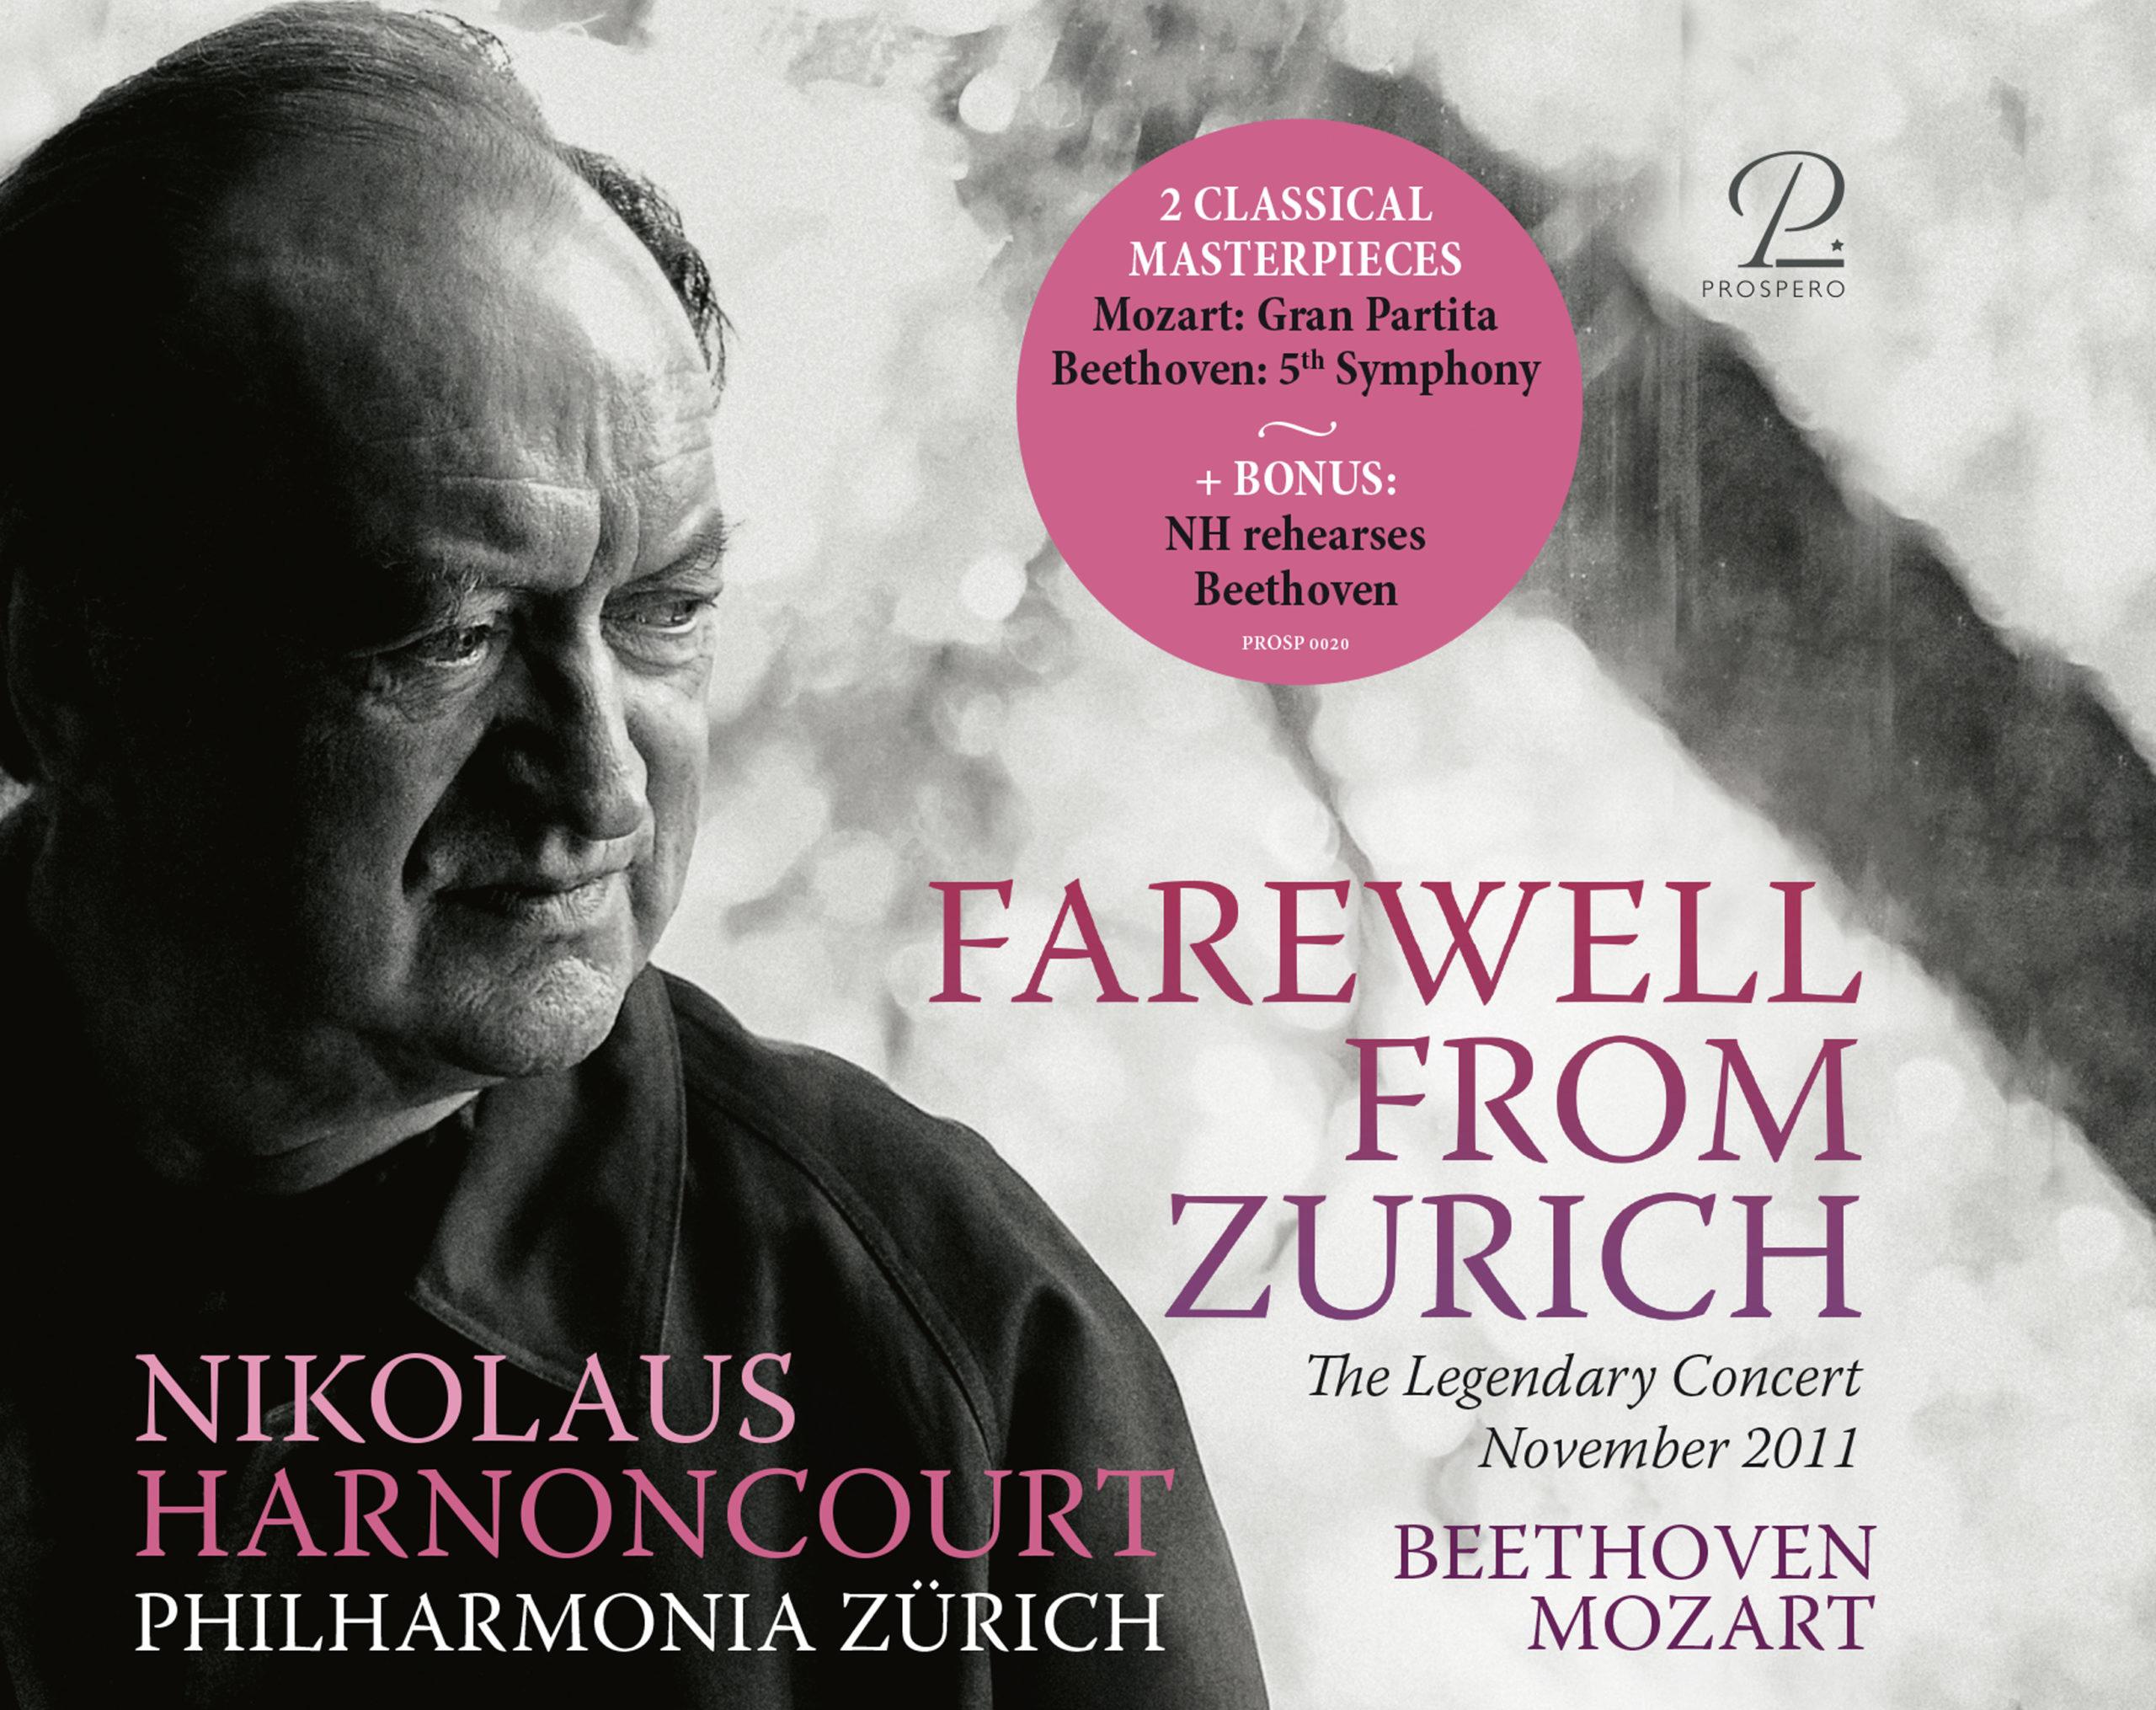 Farewell from Zurich - Cover Art